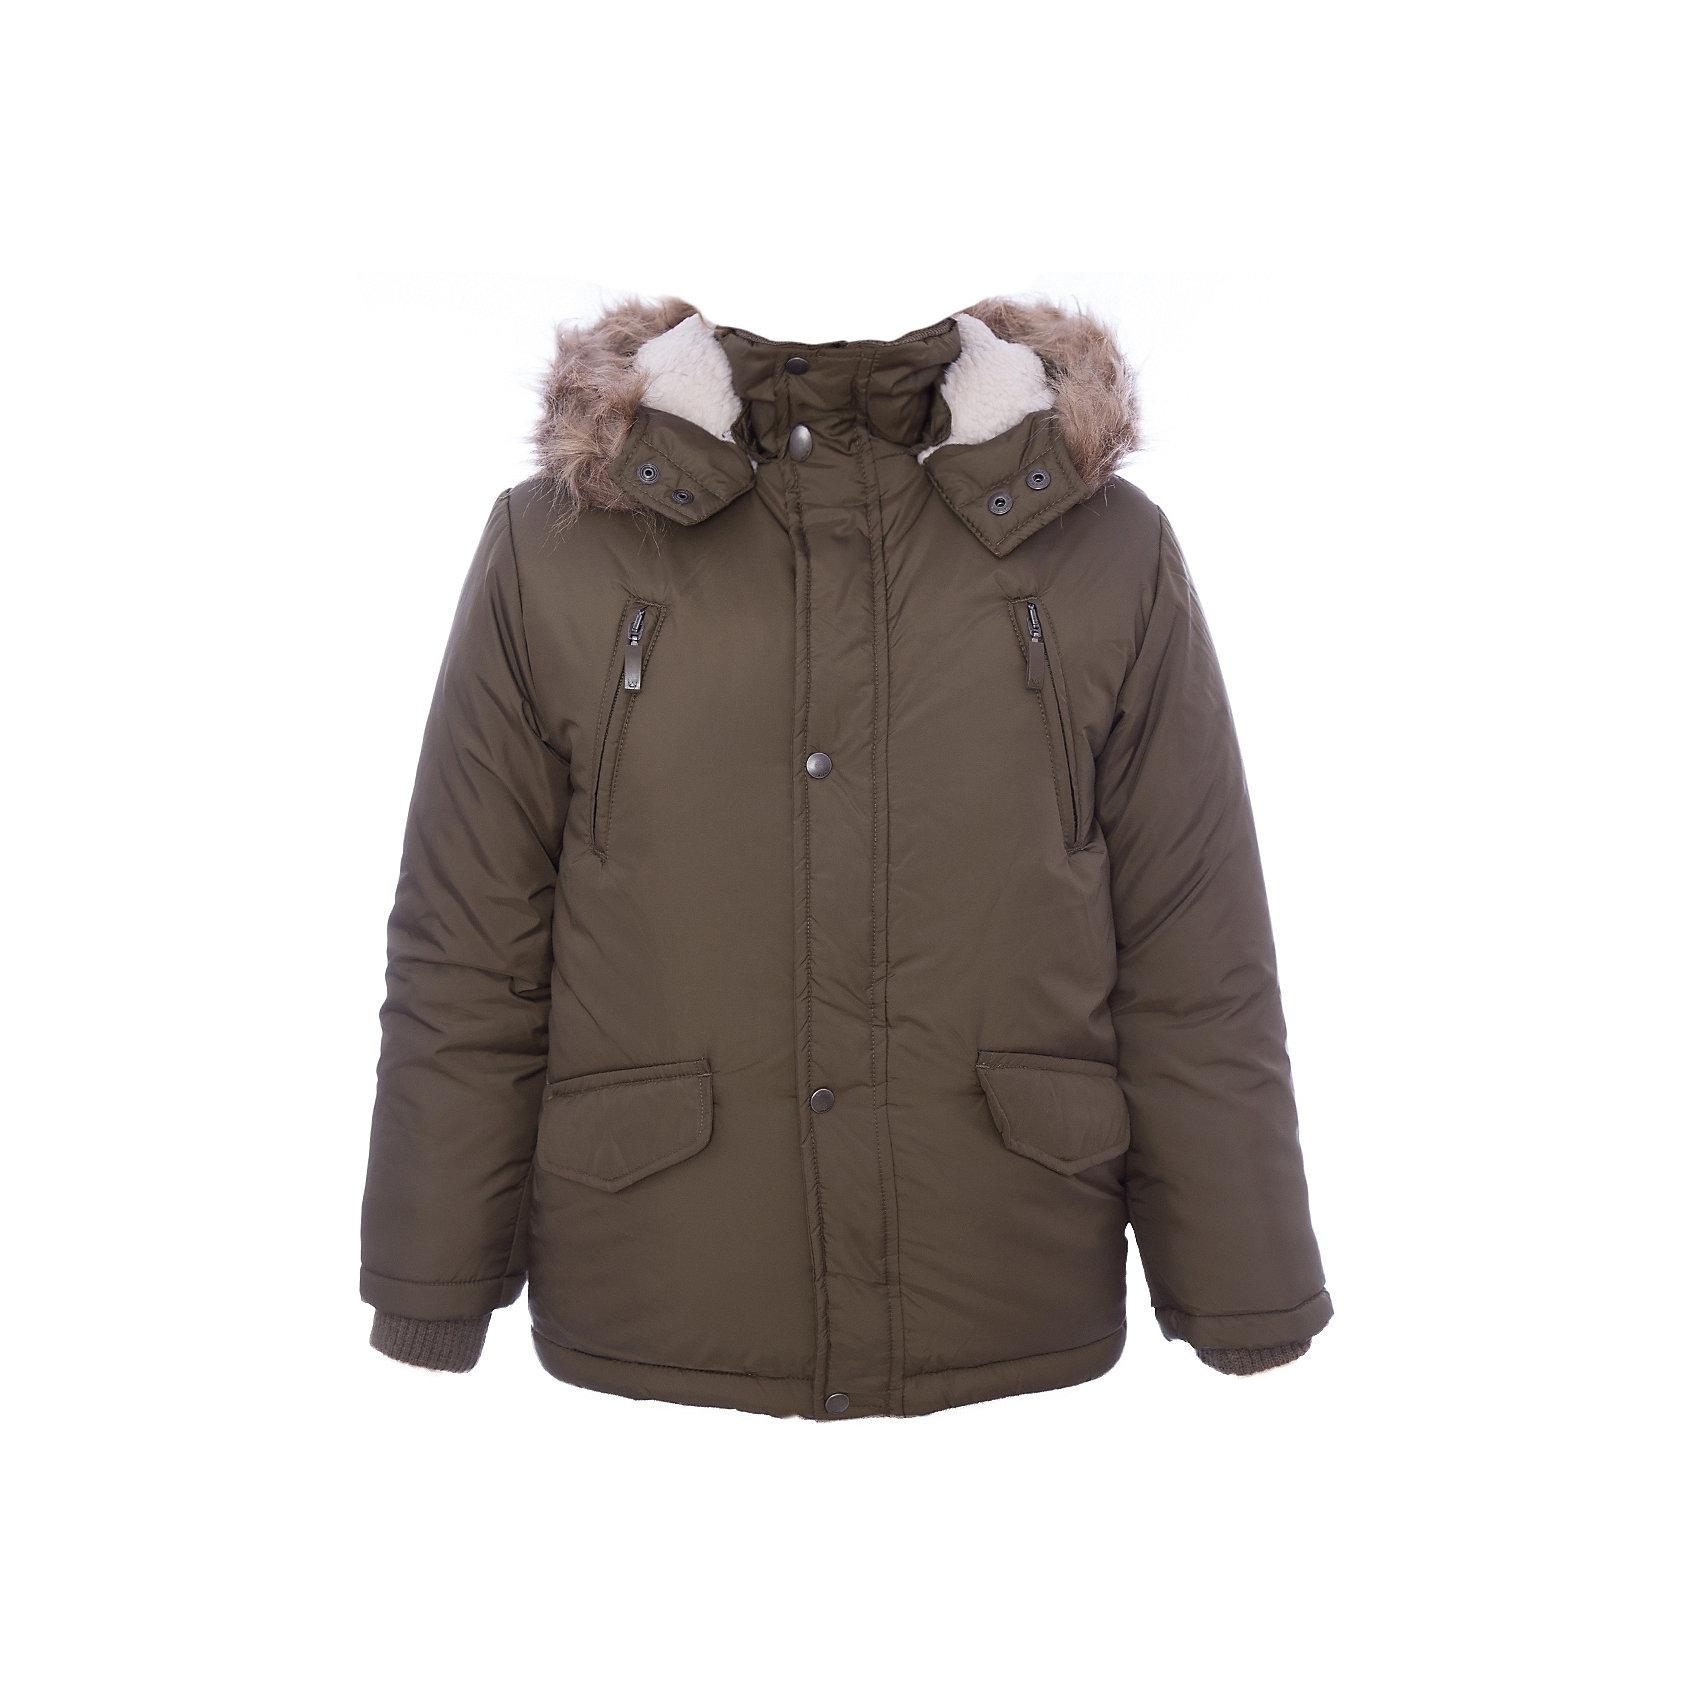 Куртка утепленная для мальчика WojcikВерхняя одежда<br>Куртка утепленная для мальчика Wojcik<br>Состав:<br>Полиэстер 100%<br><br>Ширина мм: 356<br>Глубина мм: 10<br>Высота мм: 245<br>Вес г: 519<br>Цвет: хаки<br>Возраст от месяцев: 120<br>Возраст до месяцев: 132<br>Пол: Мужской<br>Возраст: Детский<br>Размер: 146,104,110,116,122,128,134,140<br>SKU: 5592058